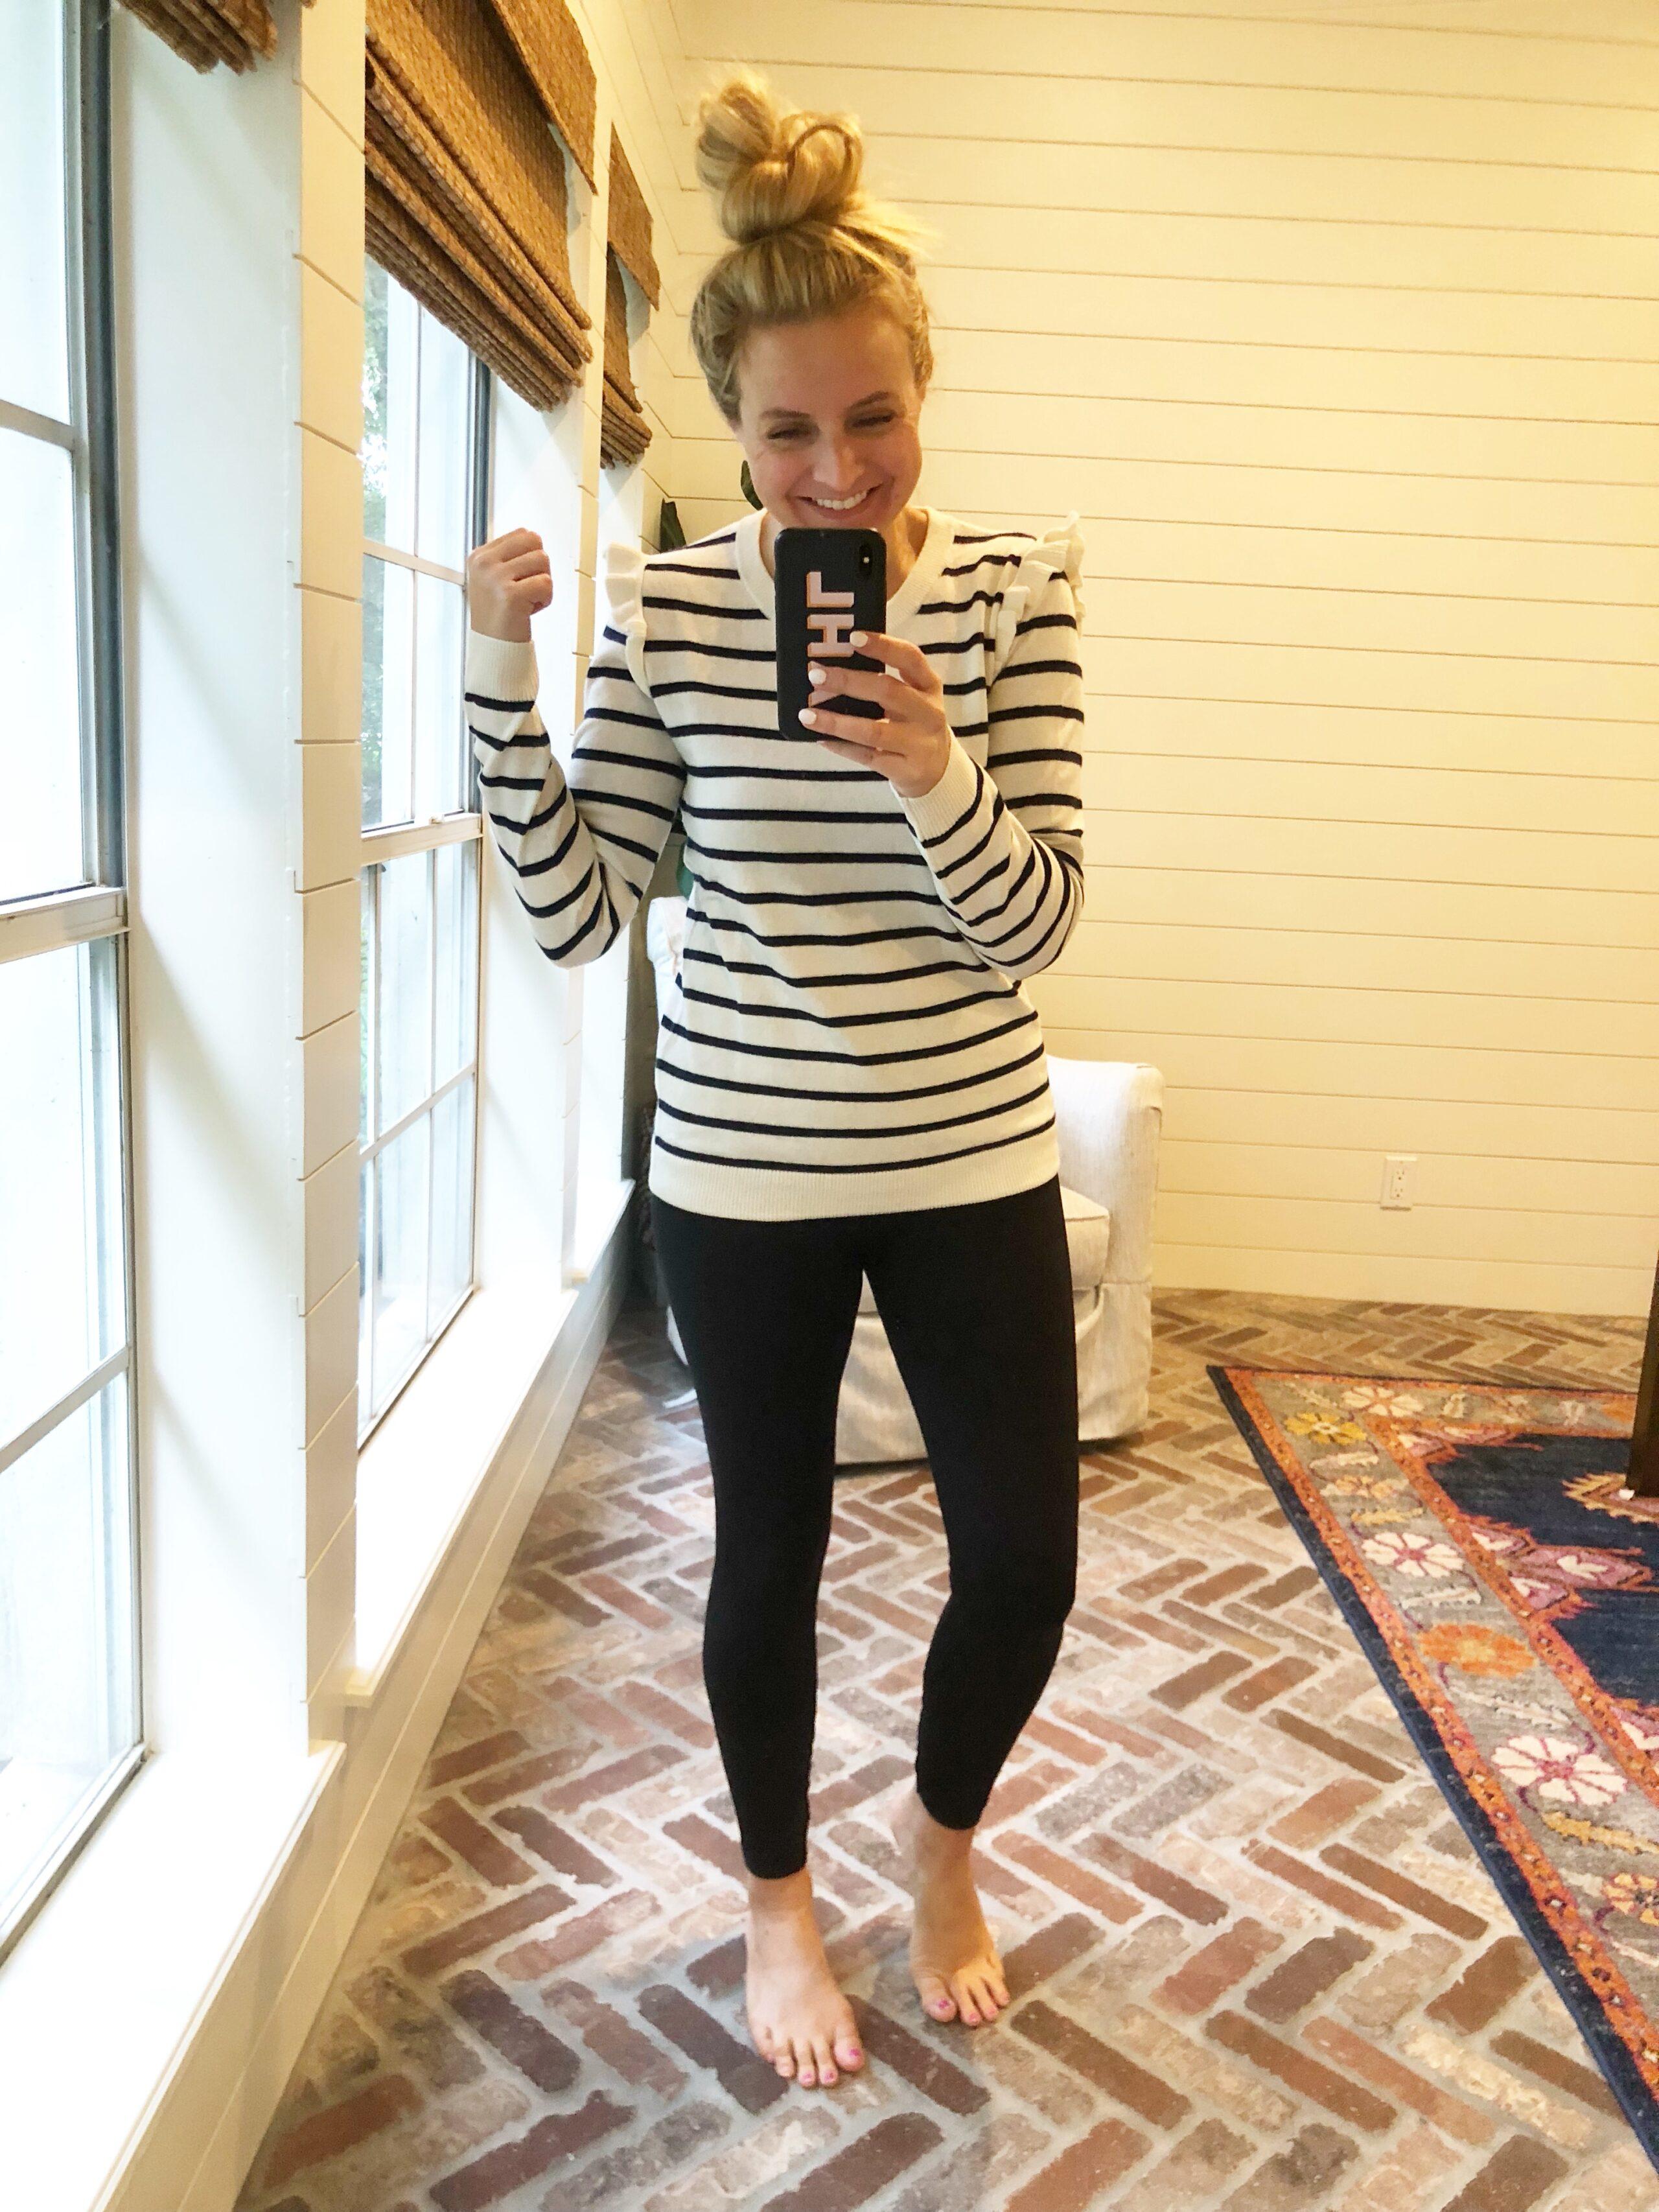 J Crew Favorites on Amazon, featured by popular Houston fashion blogger, Fancy Ashley: J Crew striped sweater